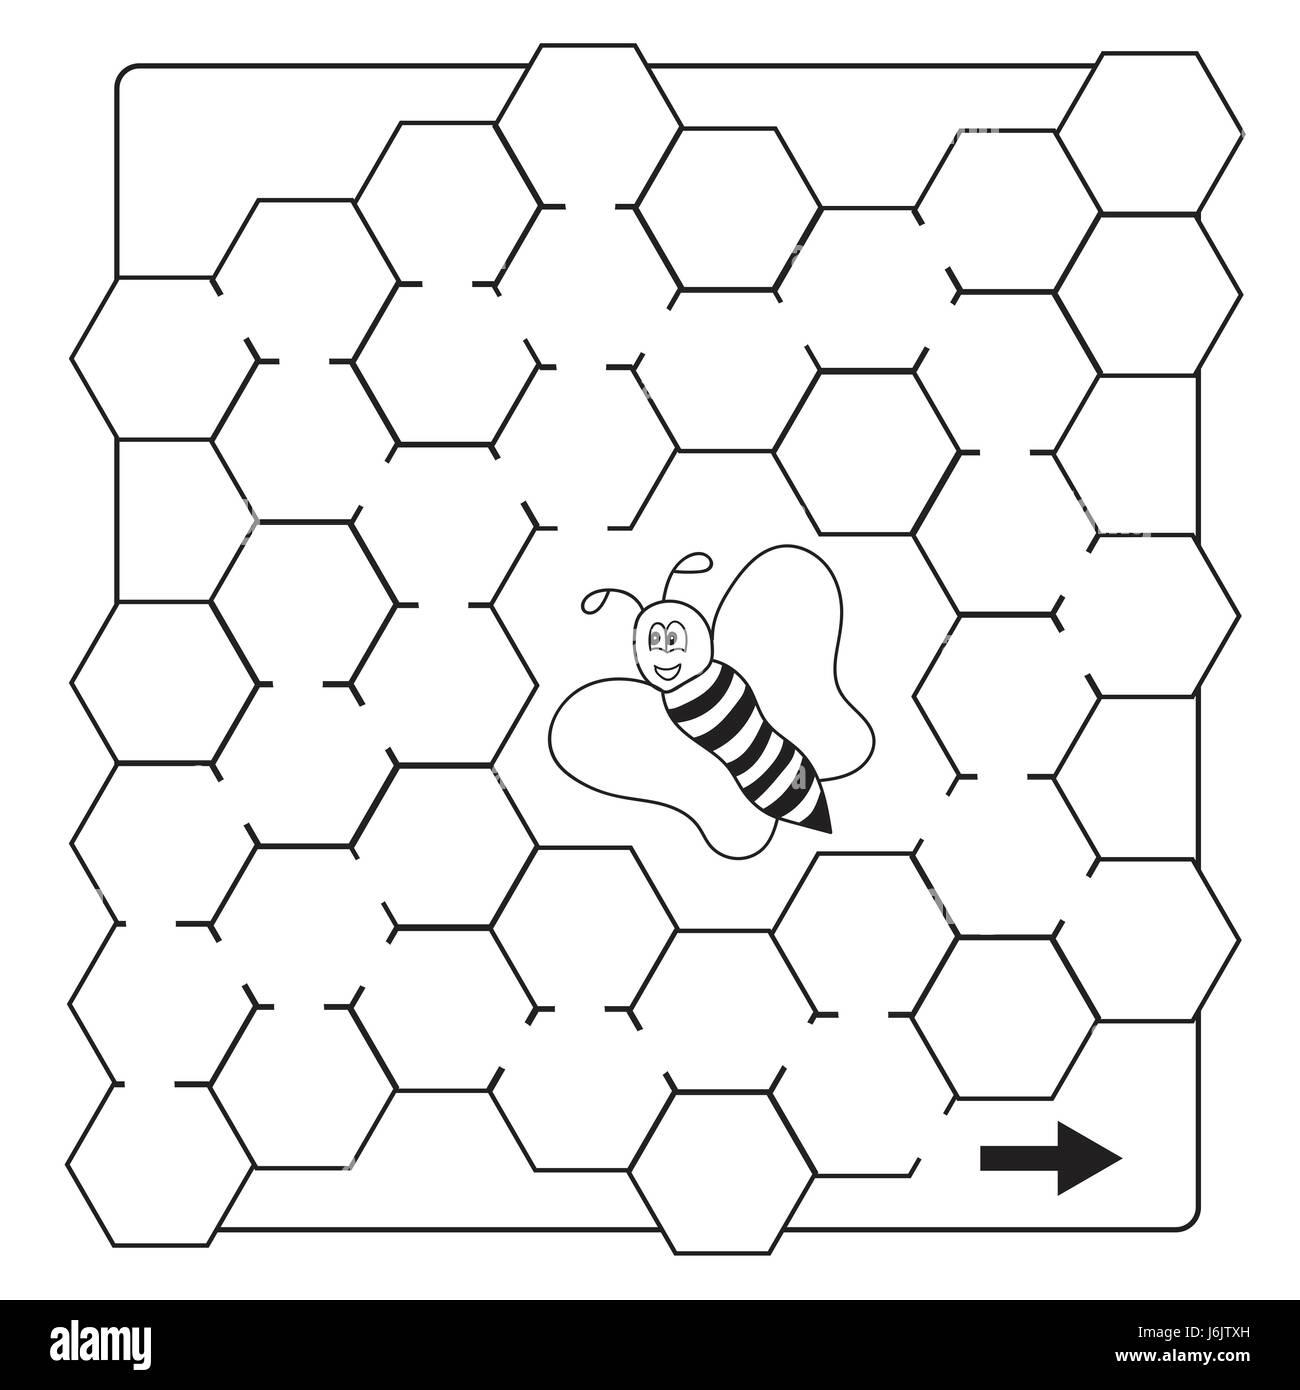 Cartoon Character Bee Stockfotos & Cartoon Character Bee Bilder - Alamy